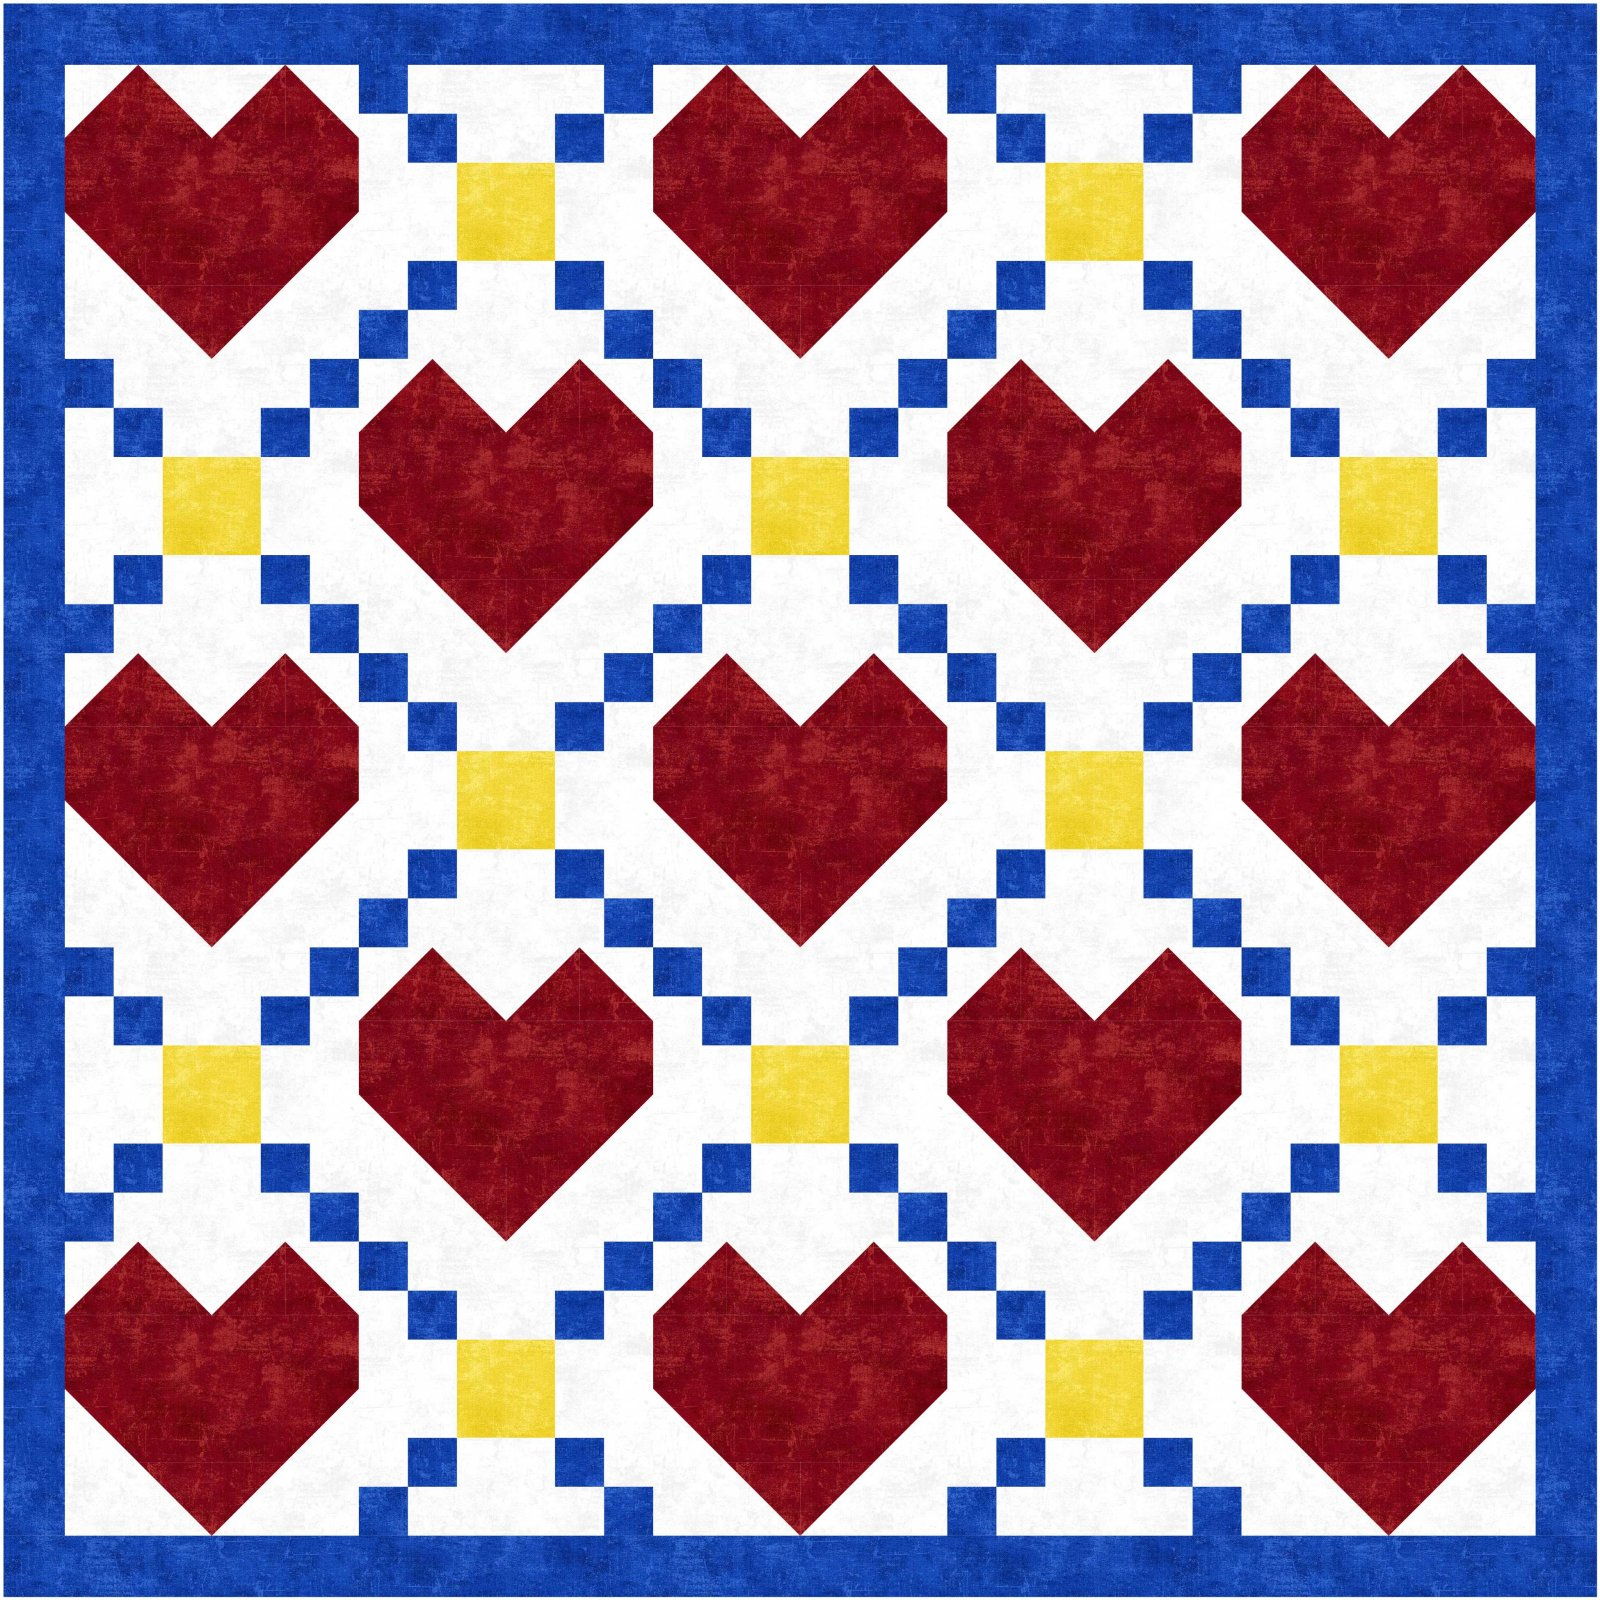 Nova Scotia Hug quilt pattern - free downloadable